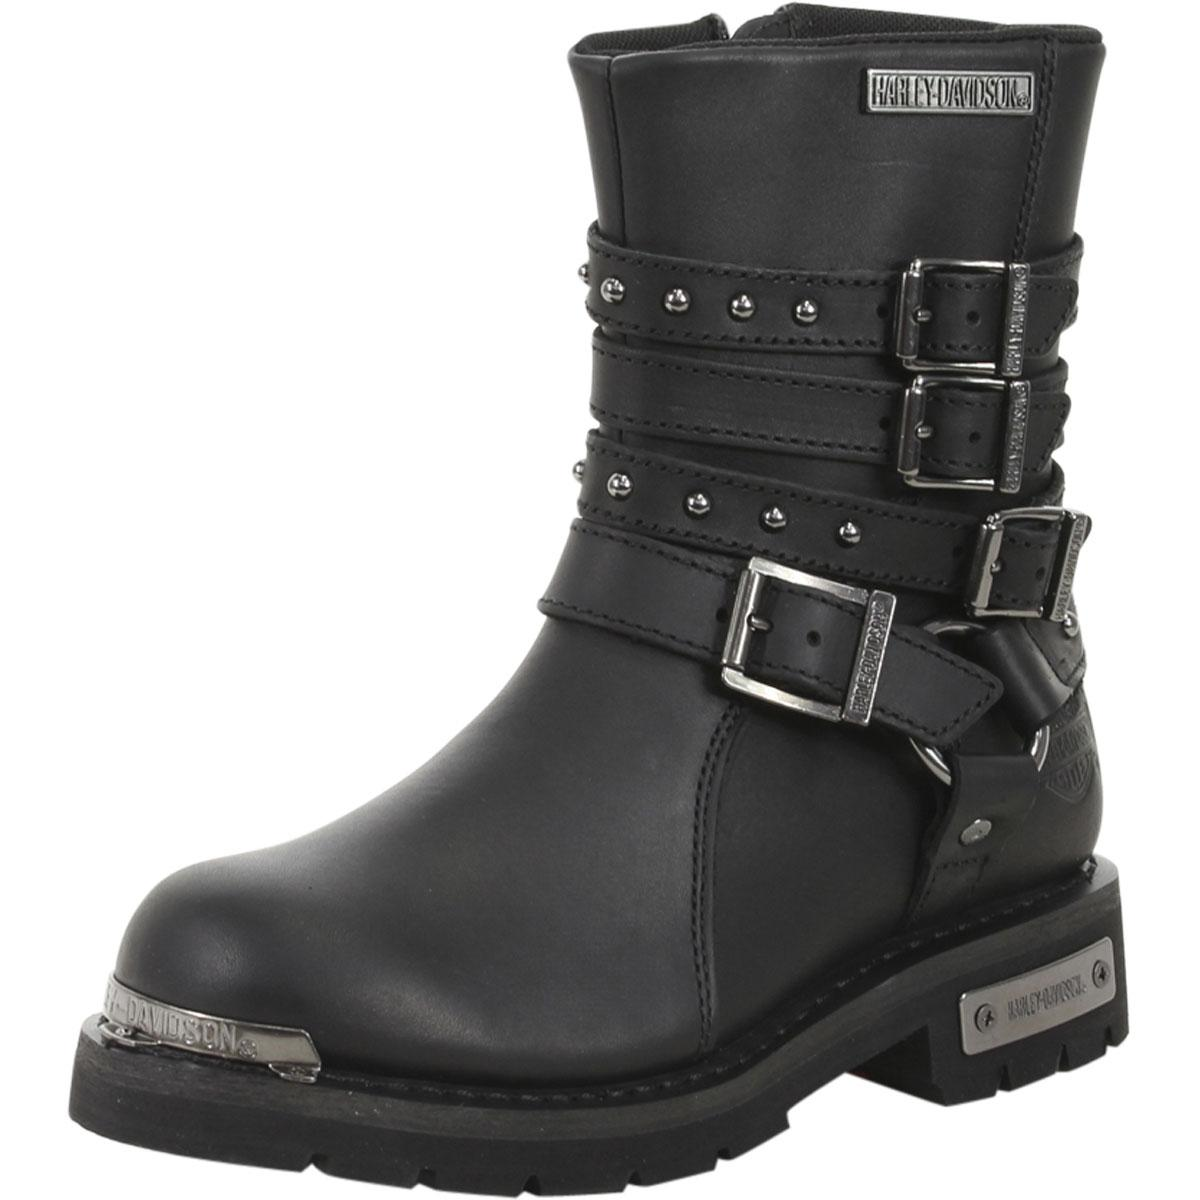 Harley Davidson Women's Eddington Motorcycle Boots Shoes